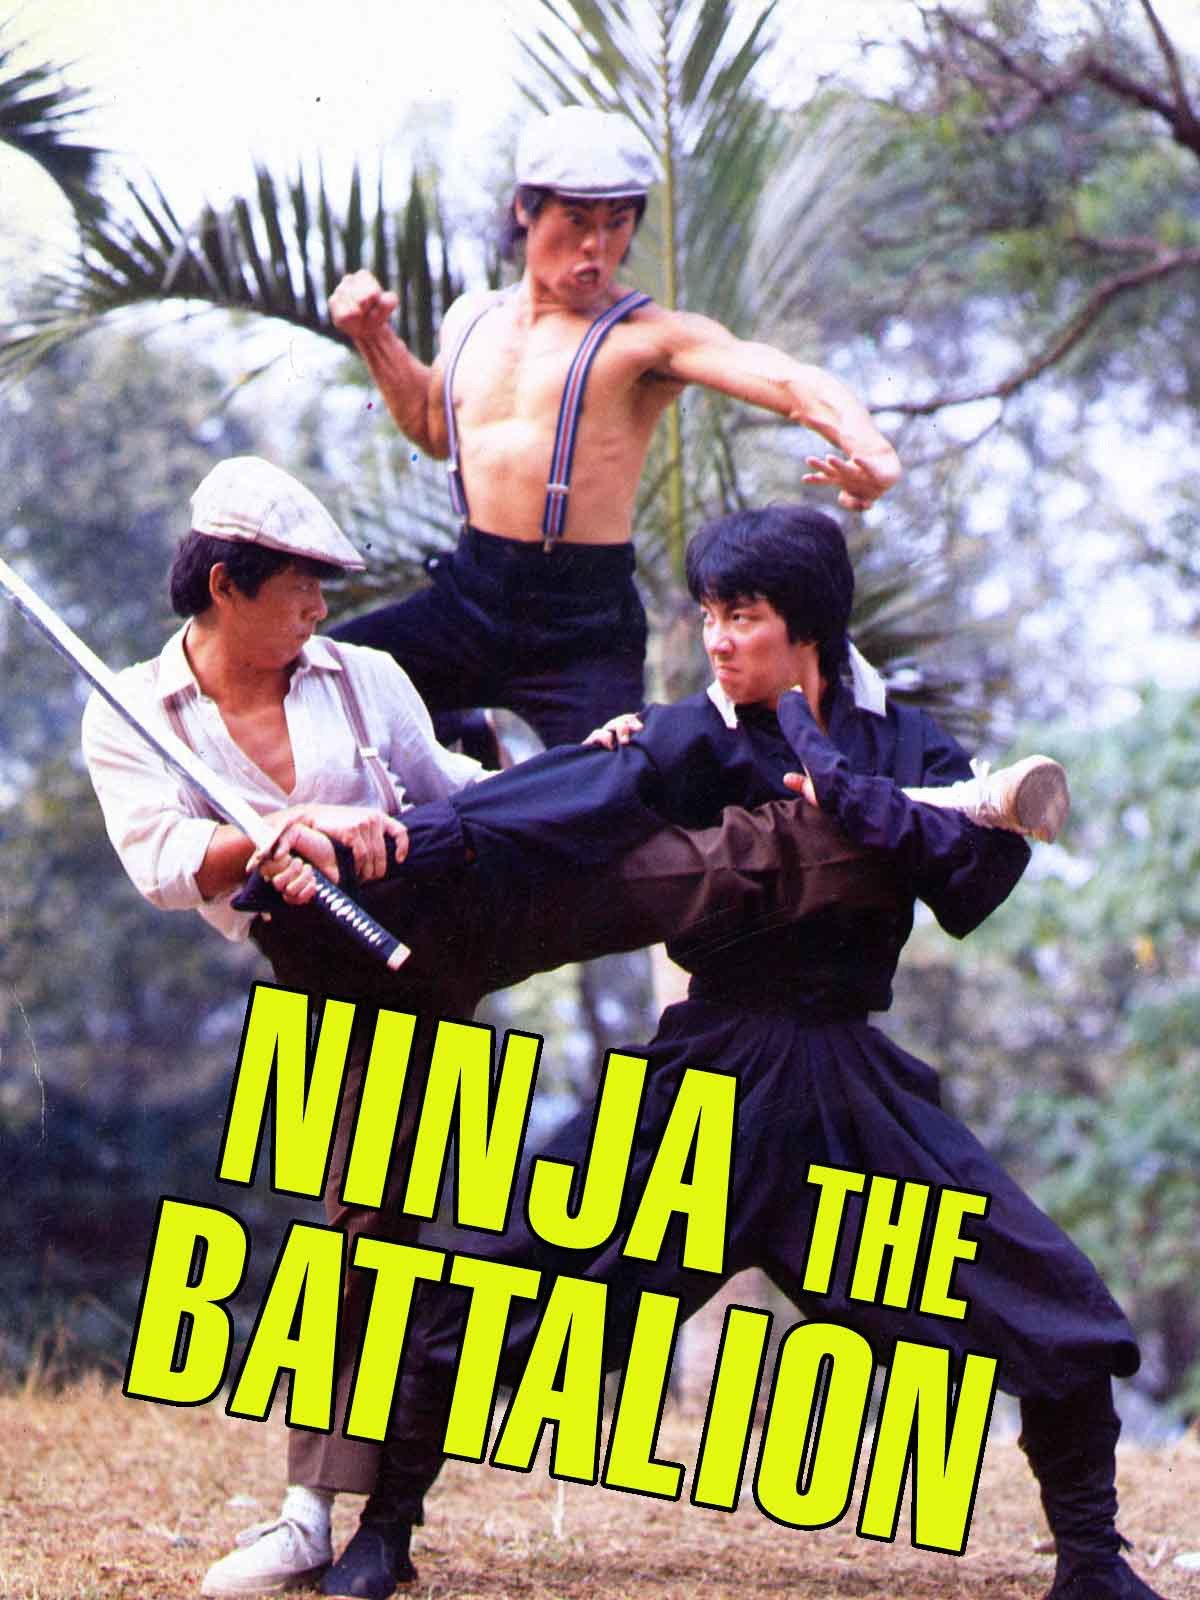 Watch Ninja The Battalion | Prime Video